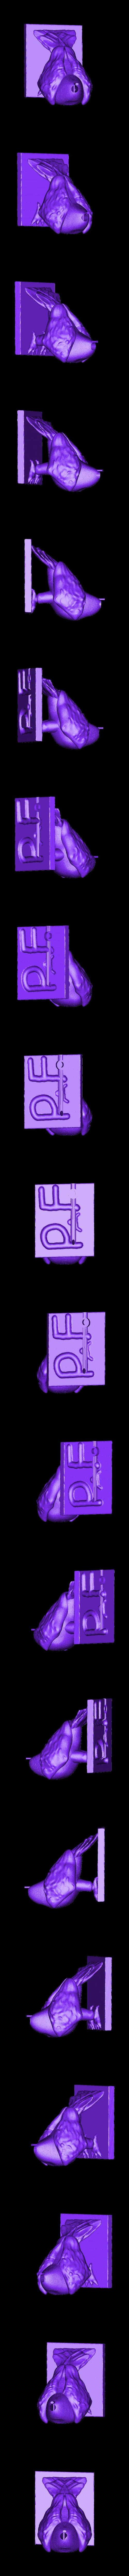 Bald_Eagle_body.obj Download free OBJ file Eagle Lamp/Nightlight • 3D printable template, Pza4Rza